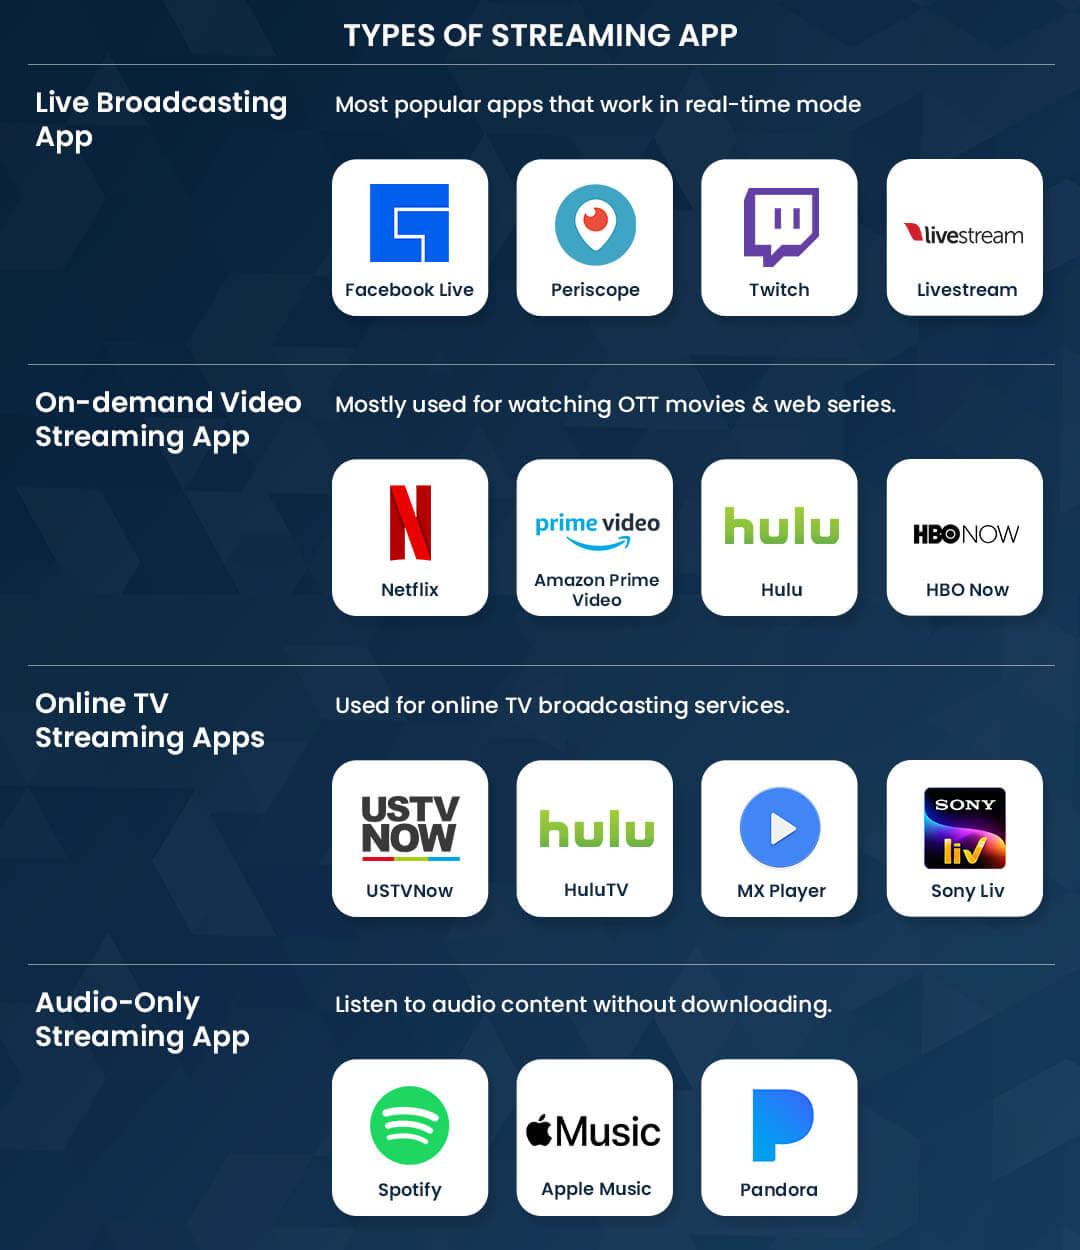 Types of Streaming App